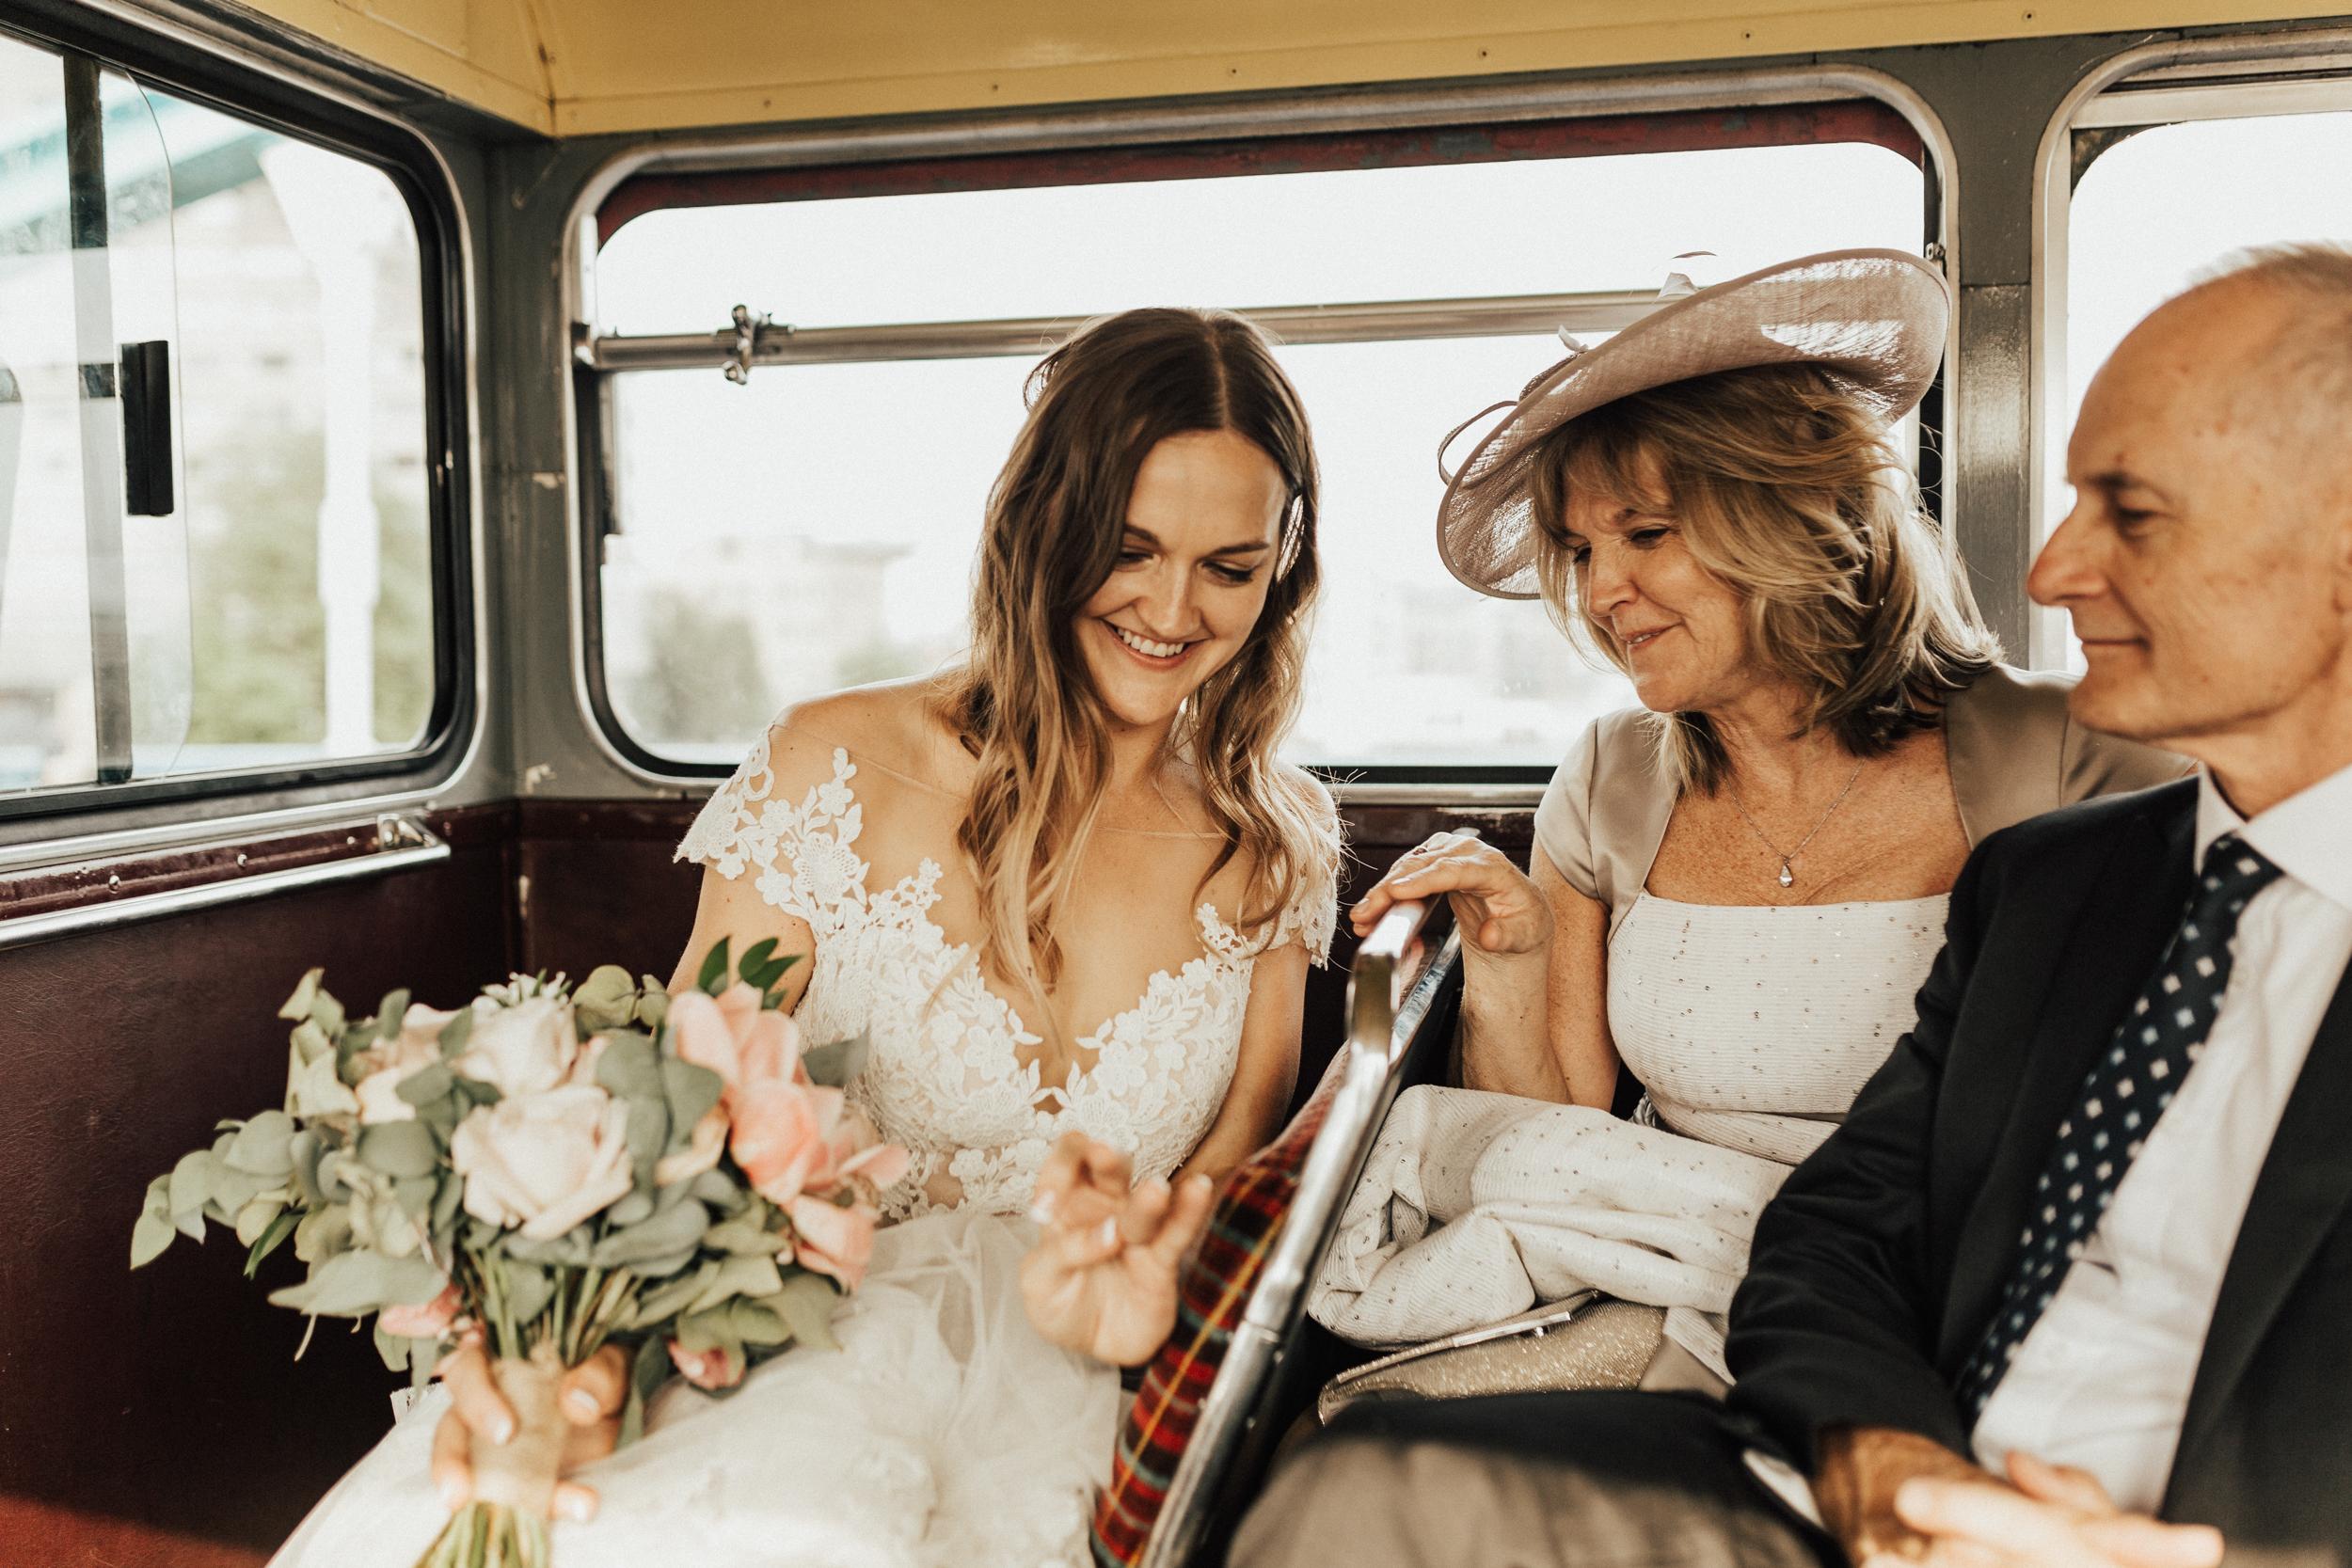 Laura-Benn-The-Asylum-London-The-Ace-Hotel-Wedding-Alternative-Darina-Stoda-Photography-497.jpg